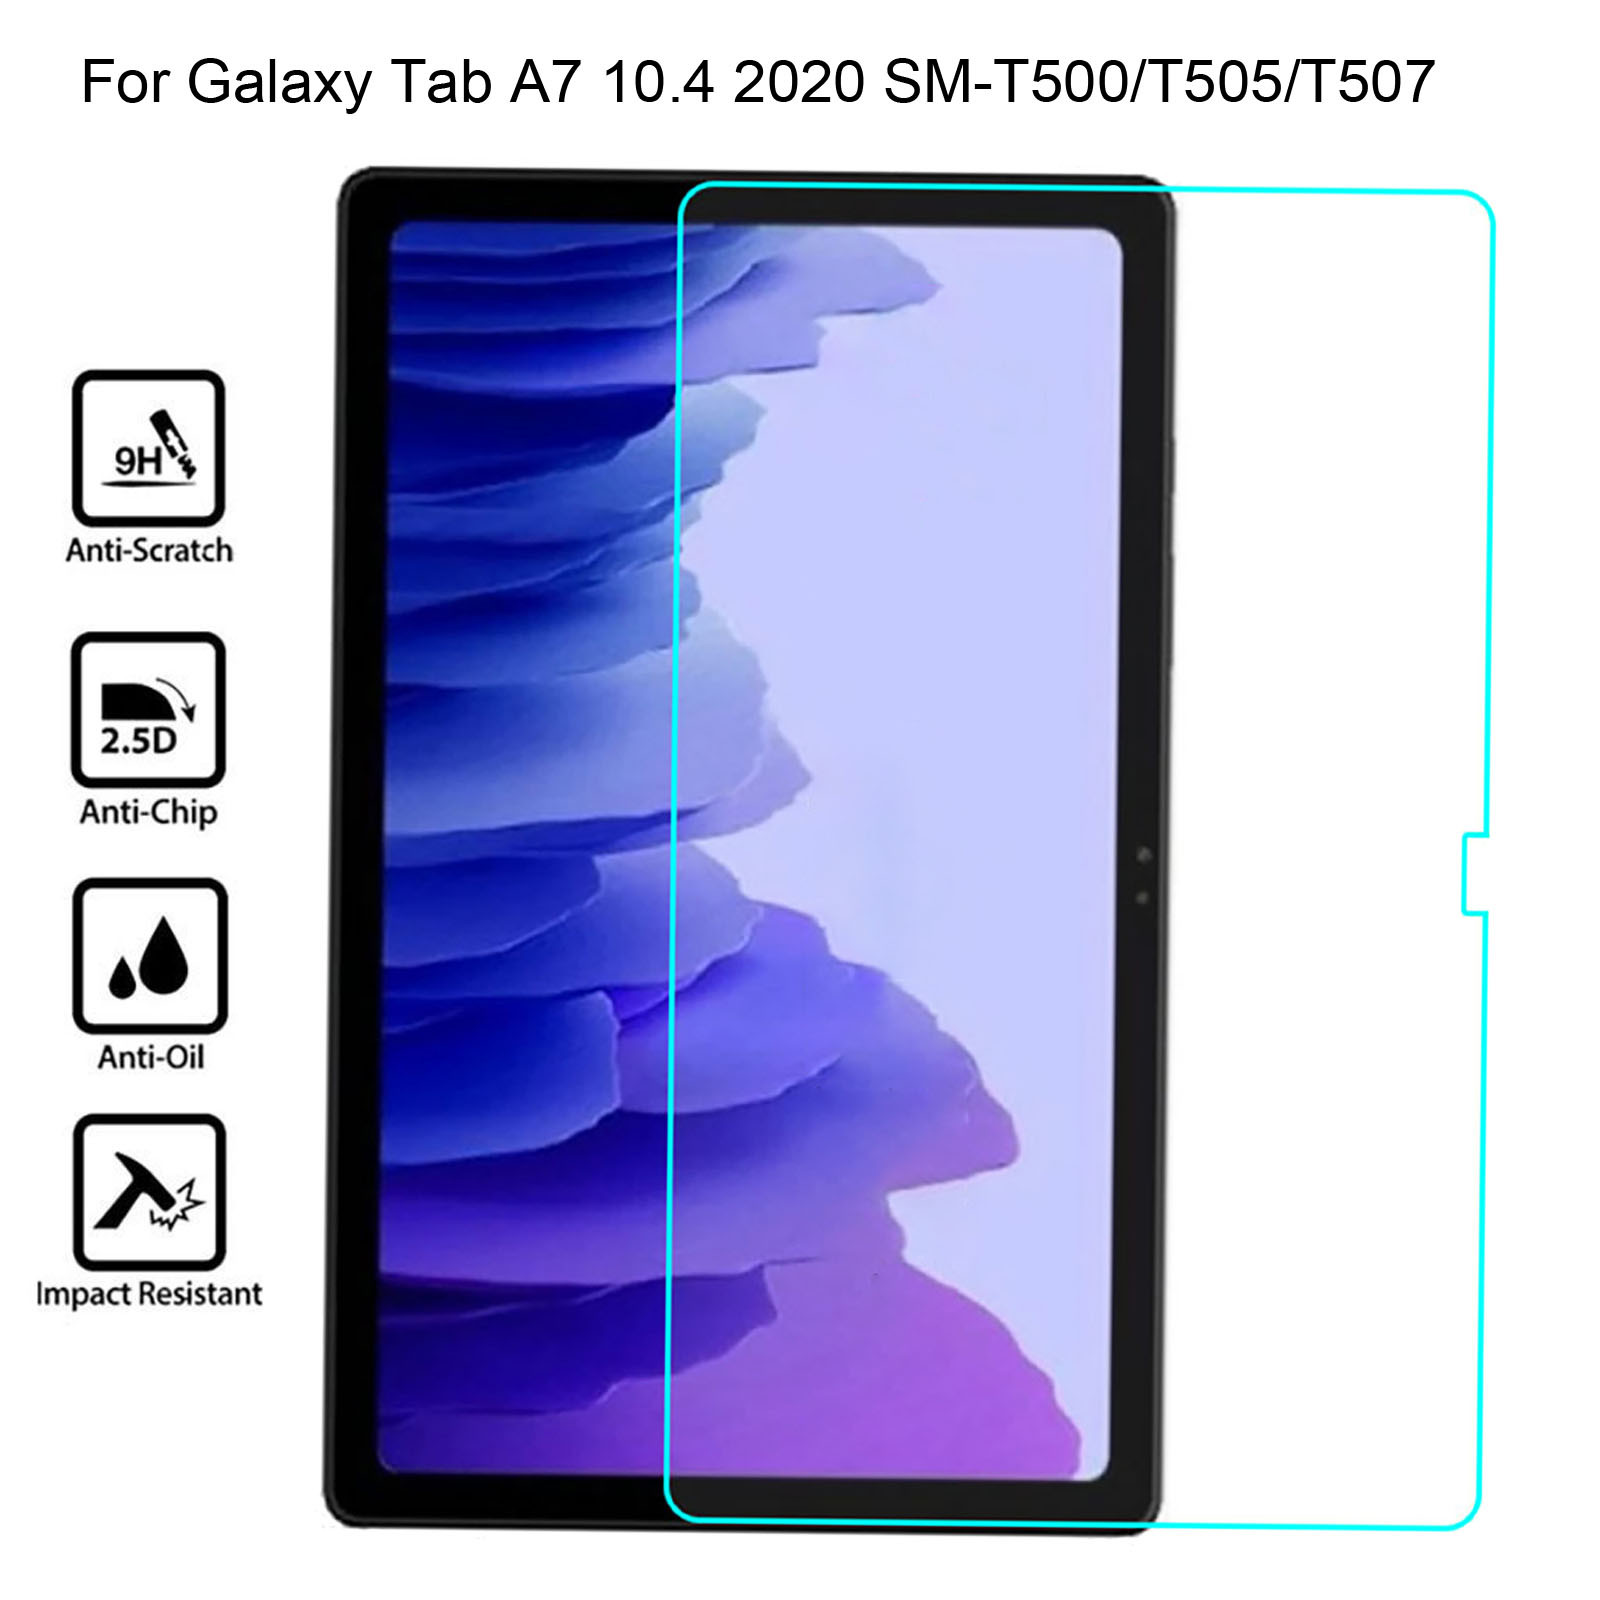 Anti-scratch bolha livre protetor de tela vidro temperado para samsung galaxy tab vidro temperado a7 10.4 2020 SM-T500/t505/t507